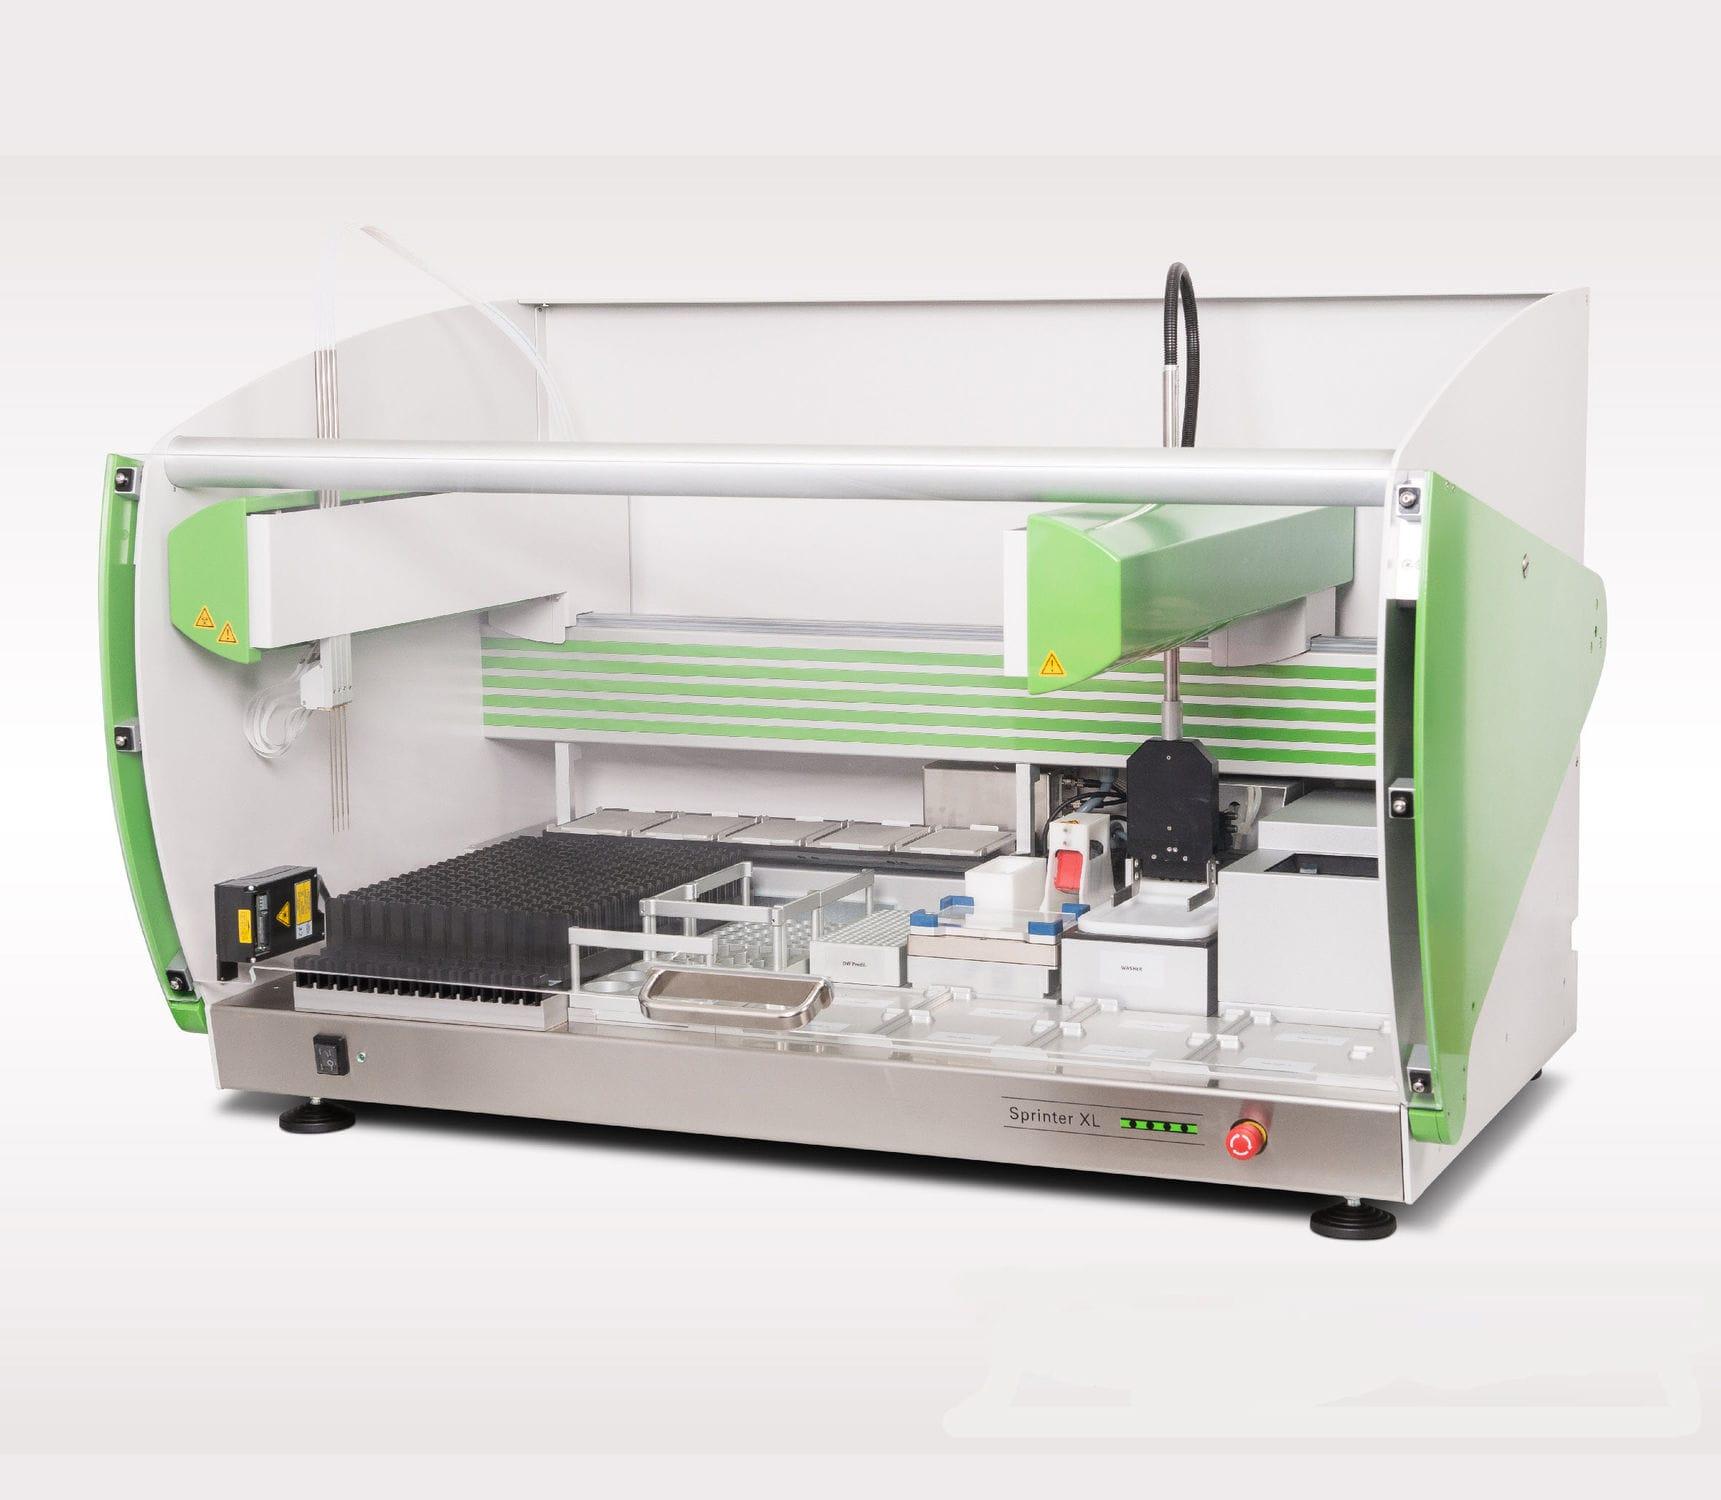 Automated immunoassay analyzer / bench-top / IFT / ELISA Sprinter XL  EUROIMMUN Medizinische Labordiagnostika AG